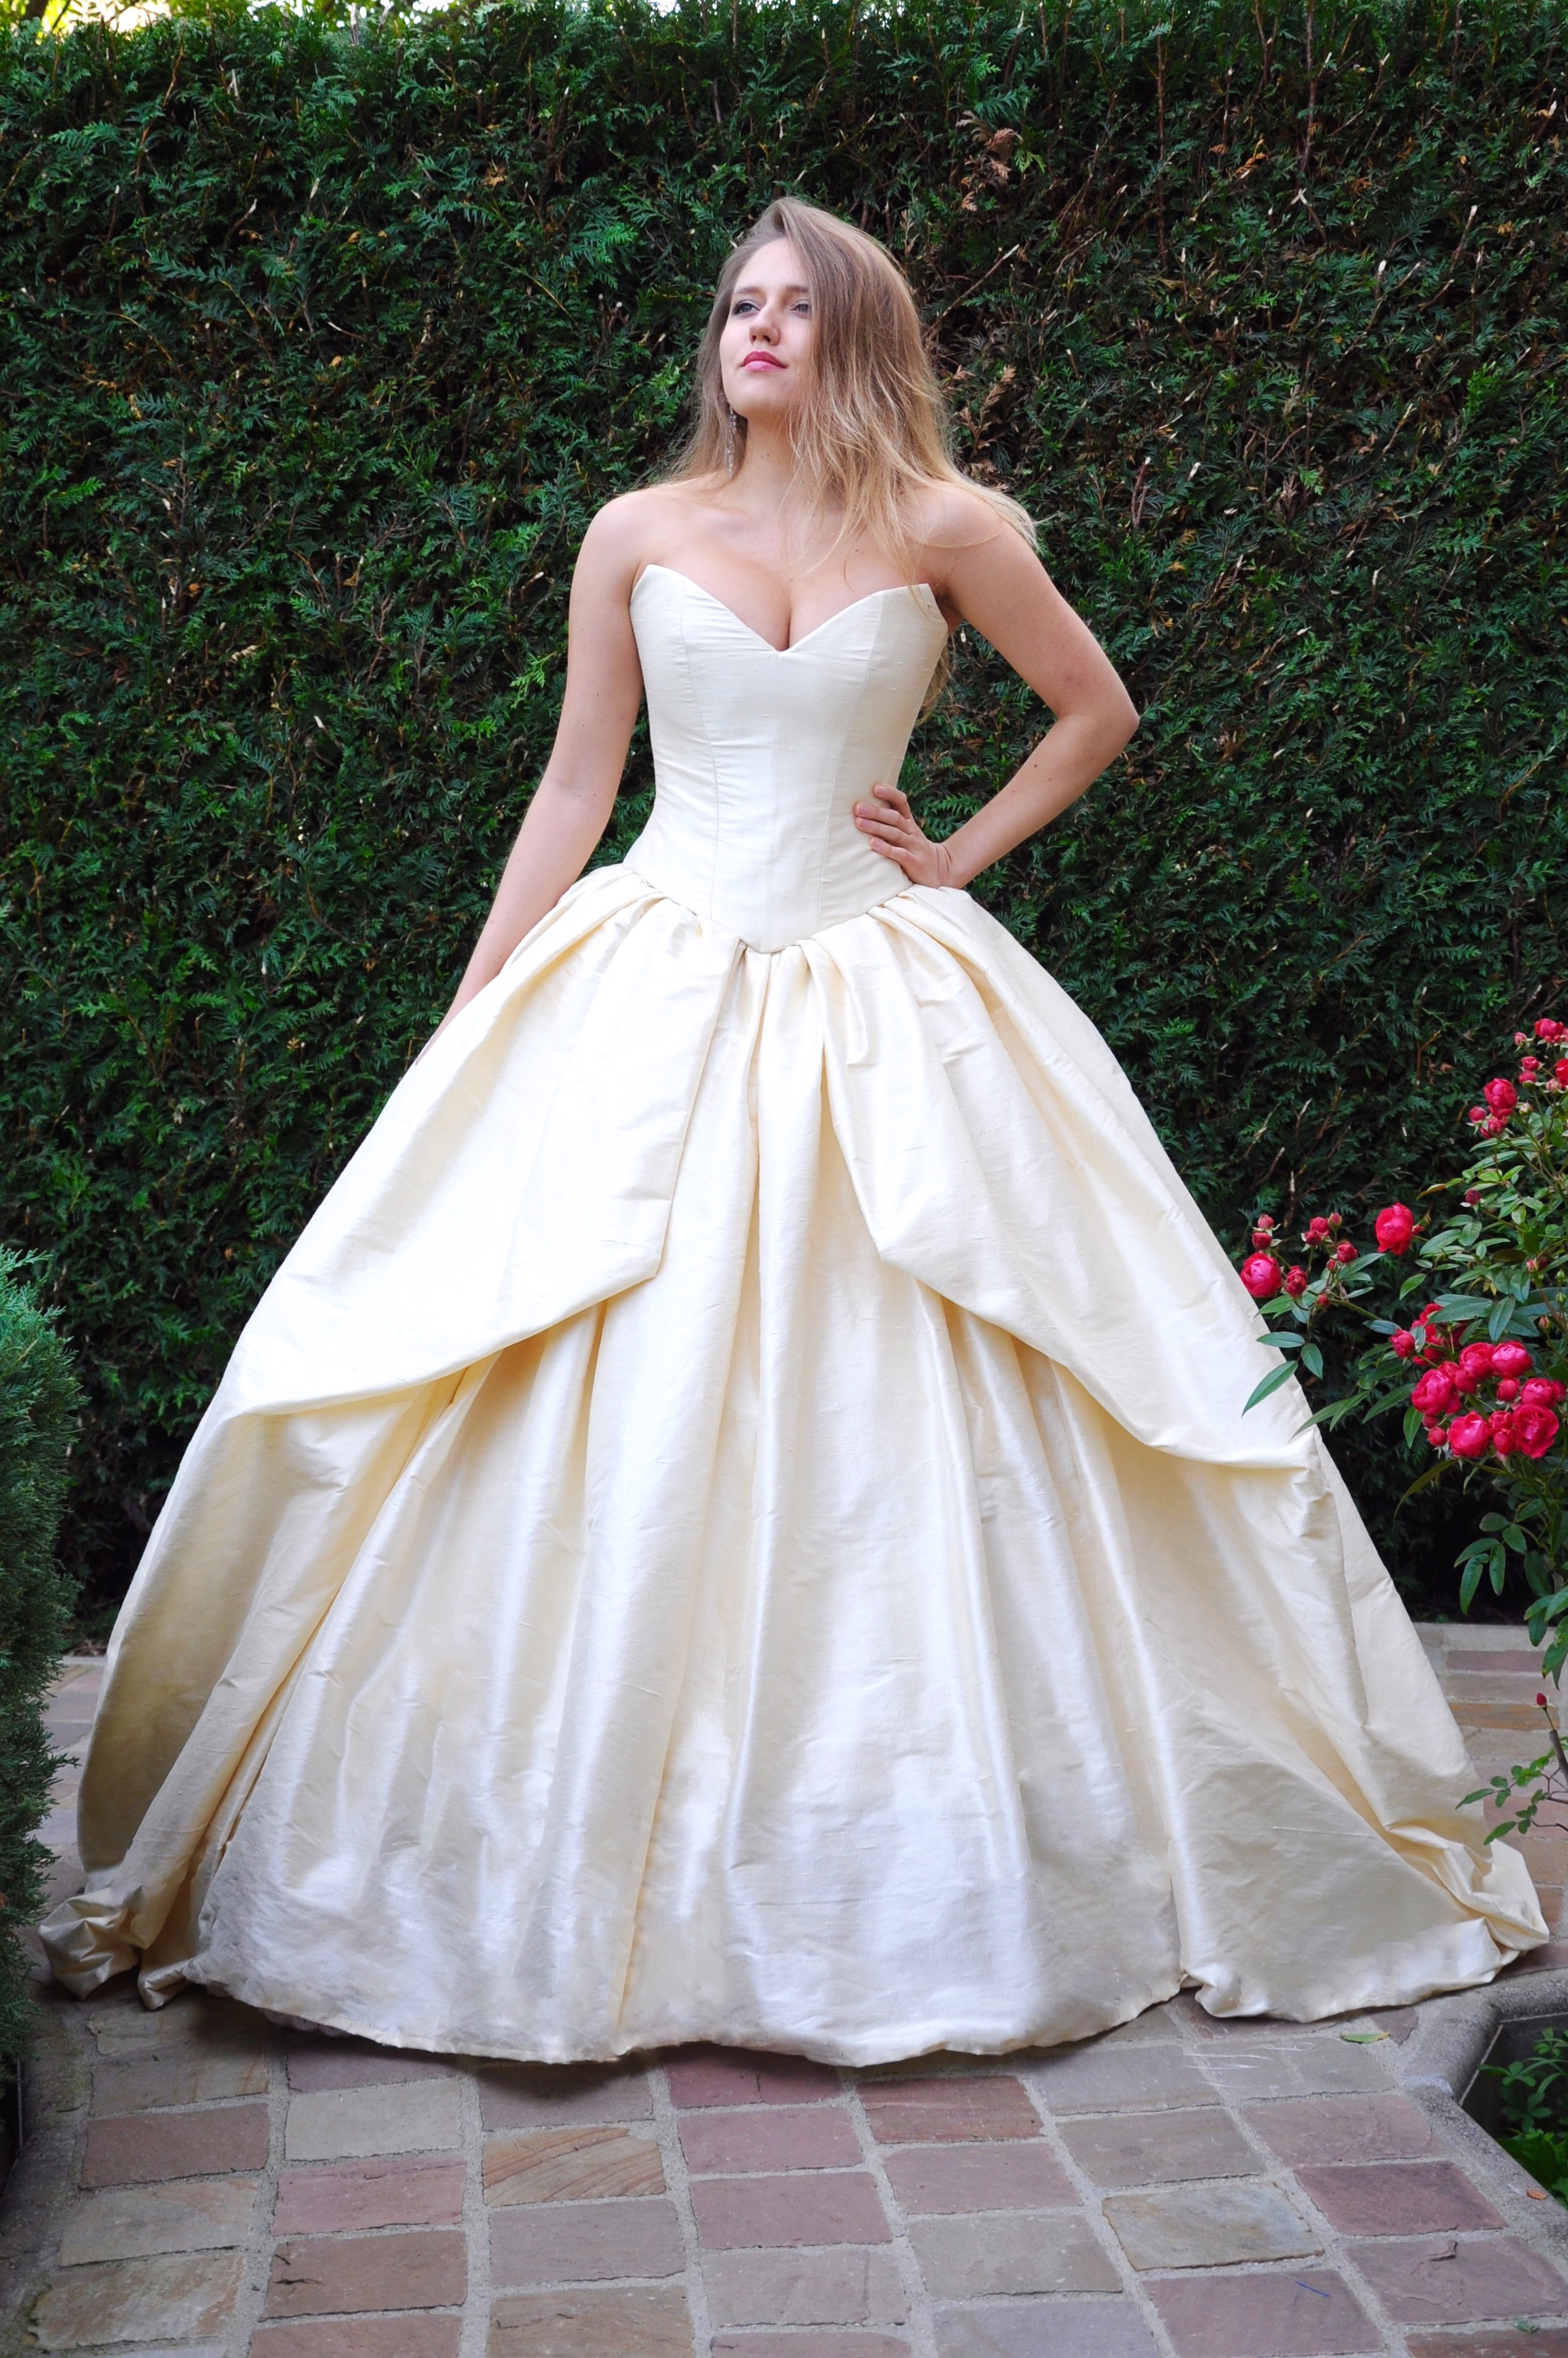 Robe de mariée Princesse Glamour Ivoire Agnes Szabelewski recadrée.jpg